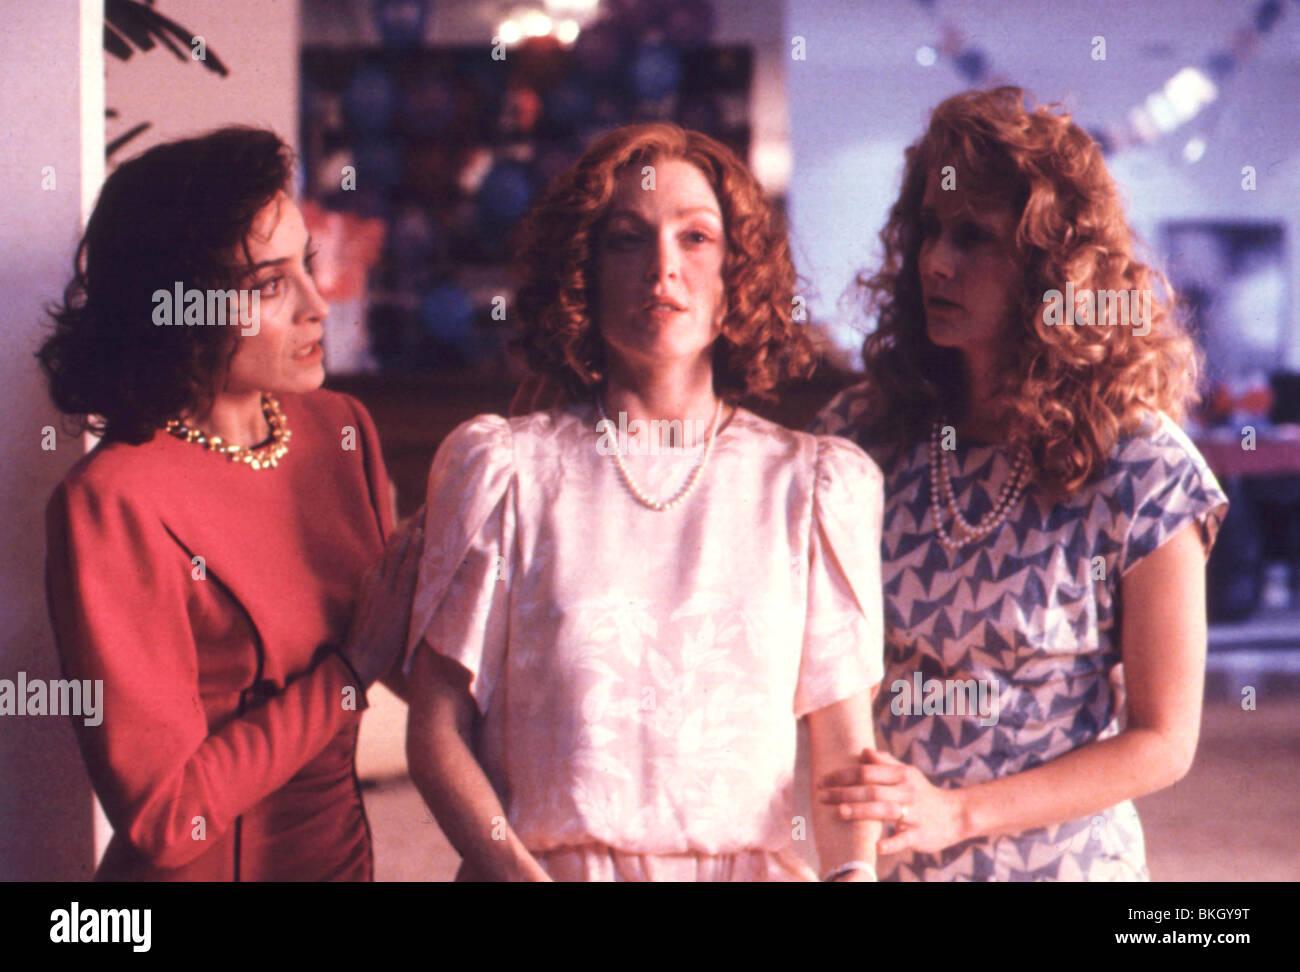 SAFE -1995 JULIANNE MOORE - Stock Image